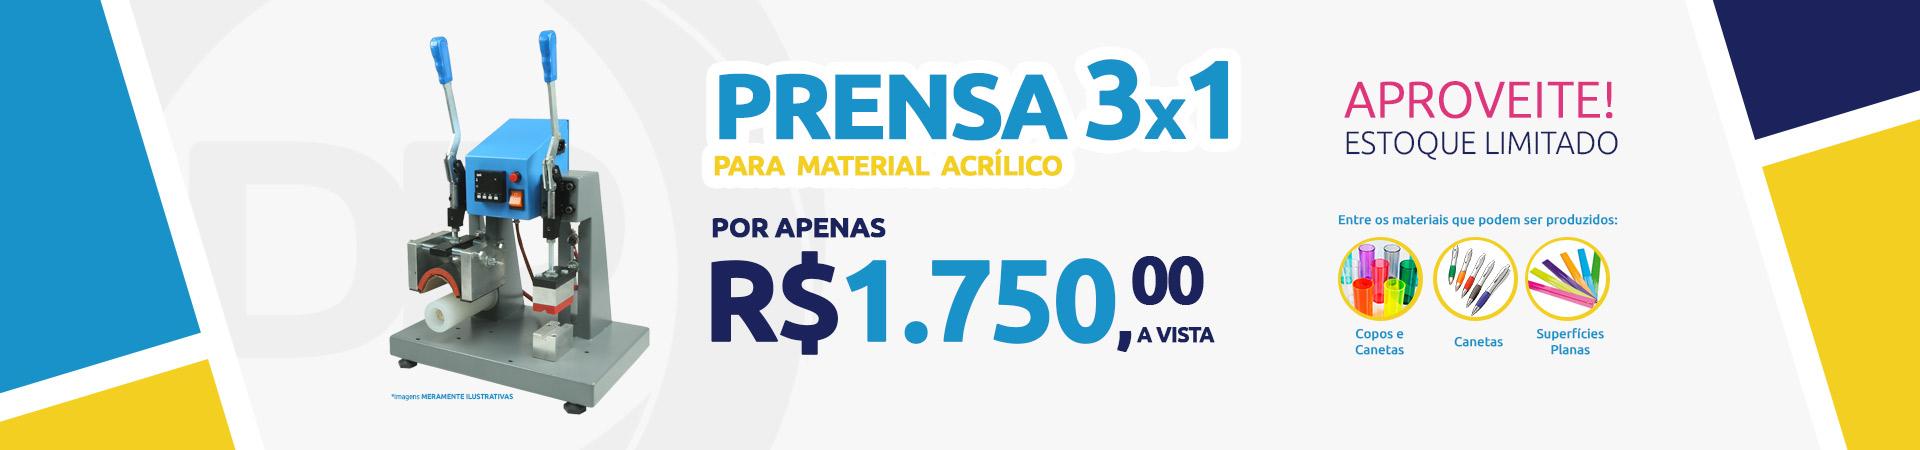 Prensa 3 x 1